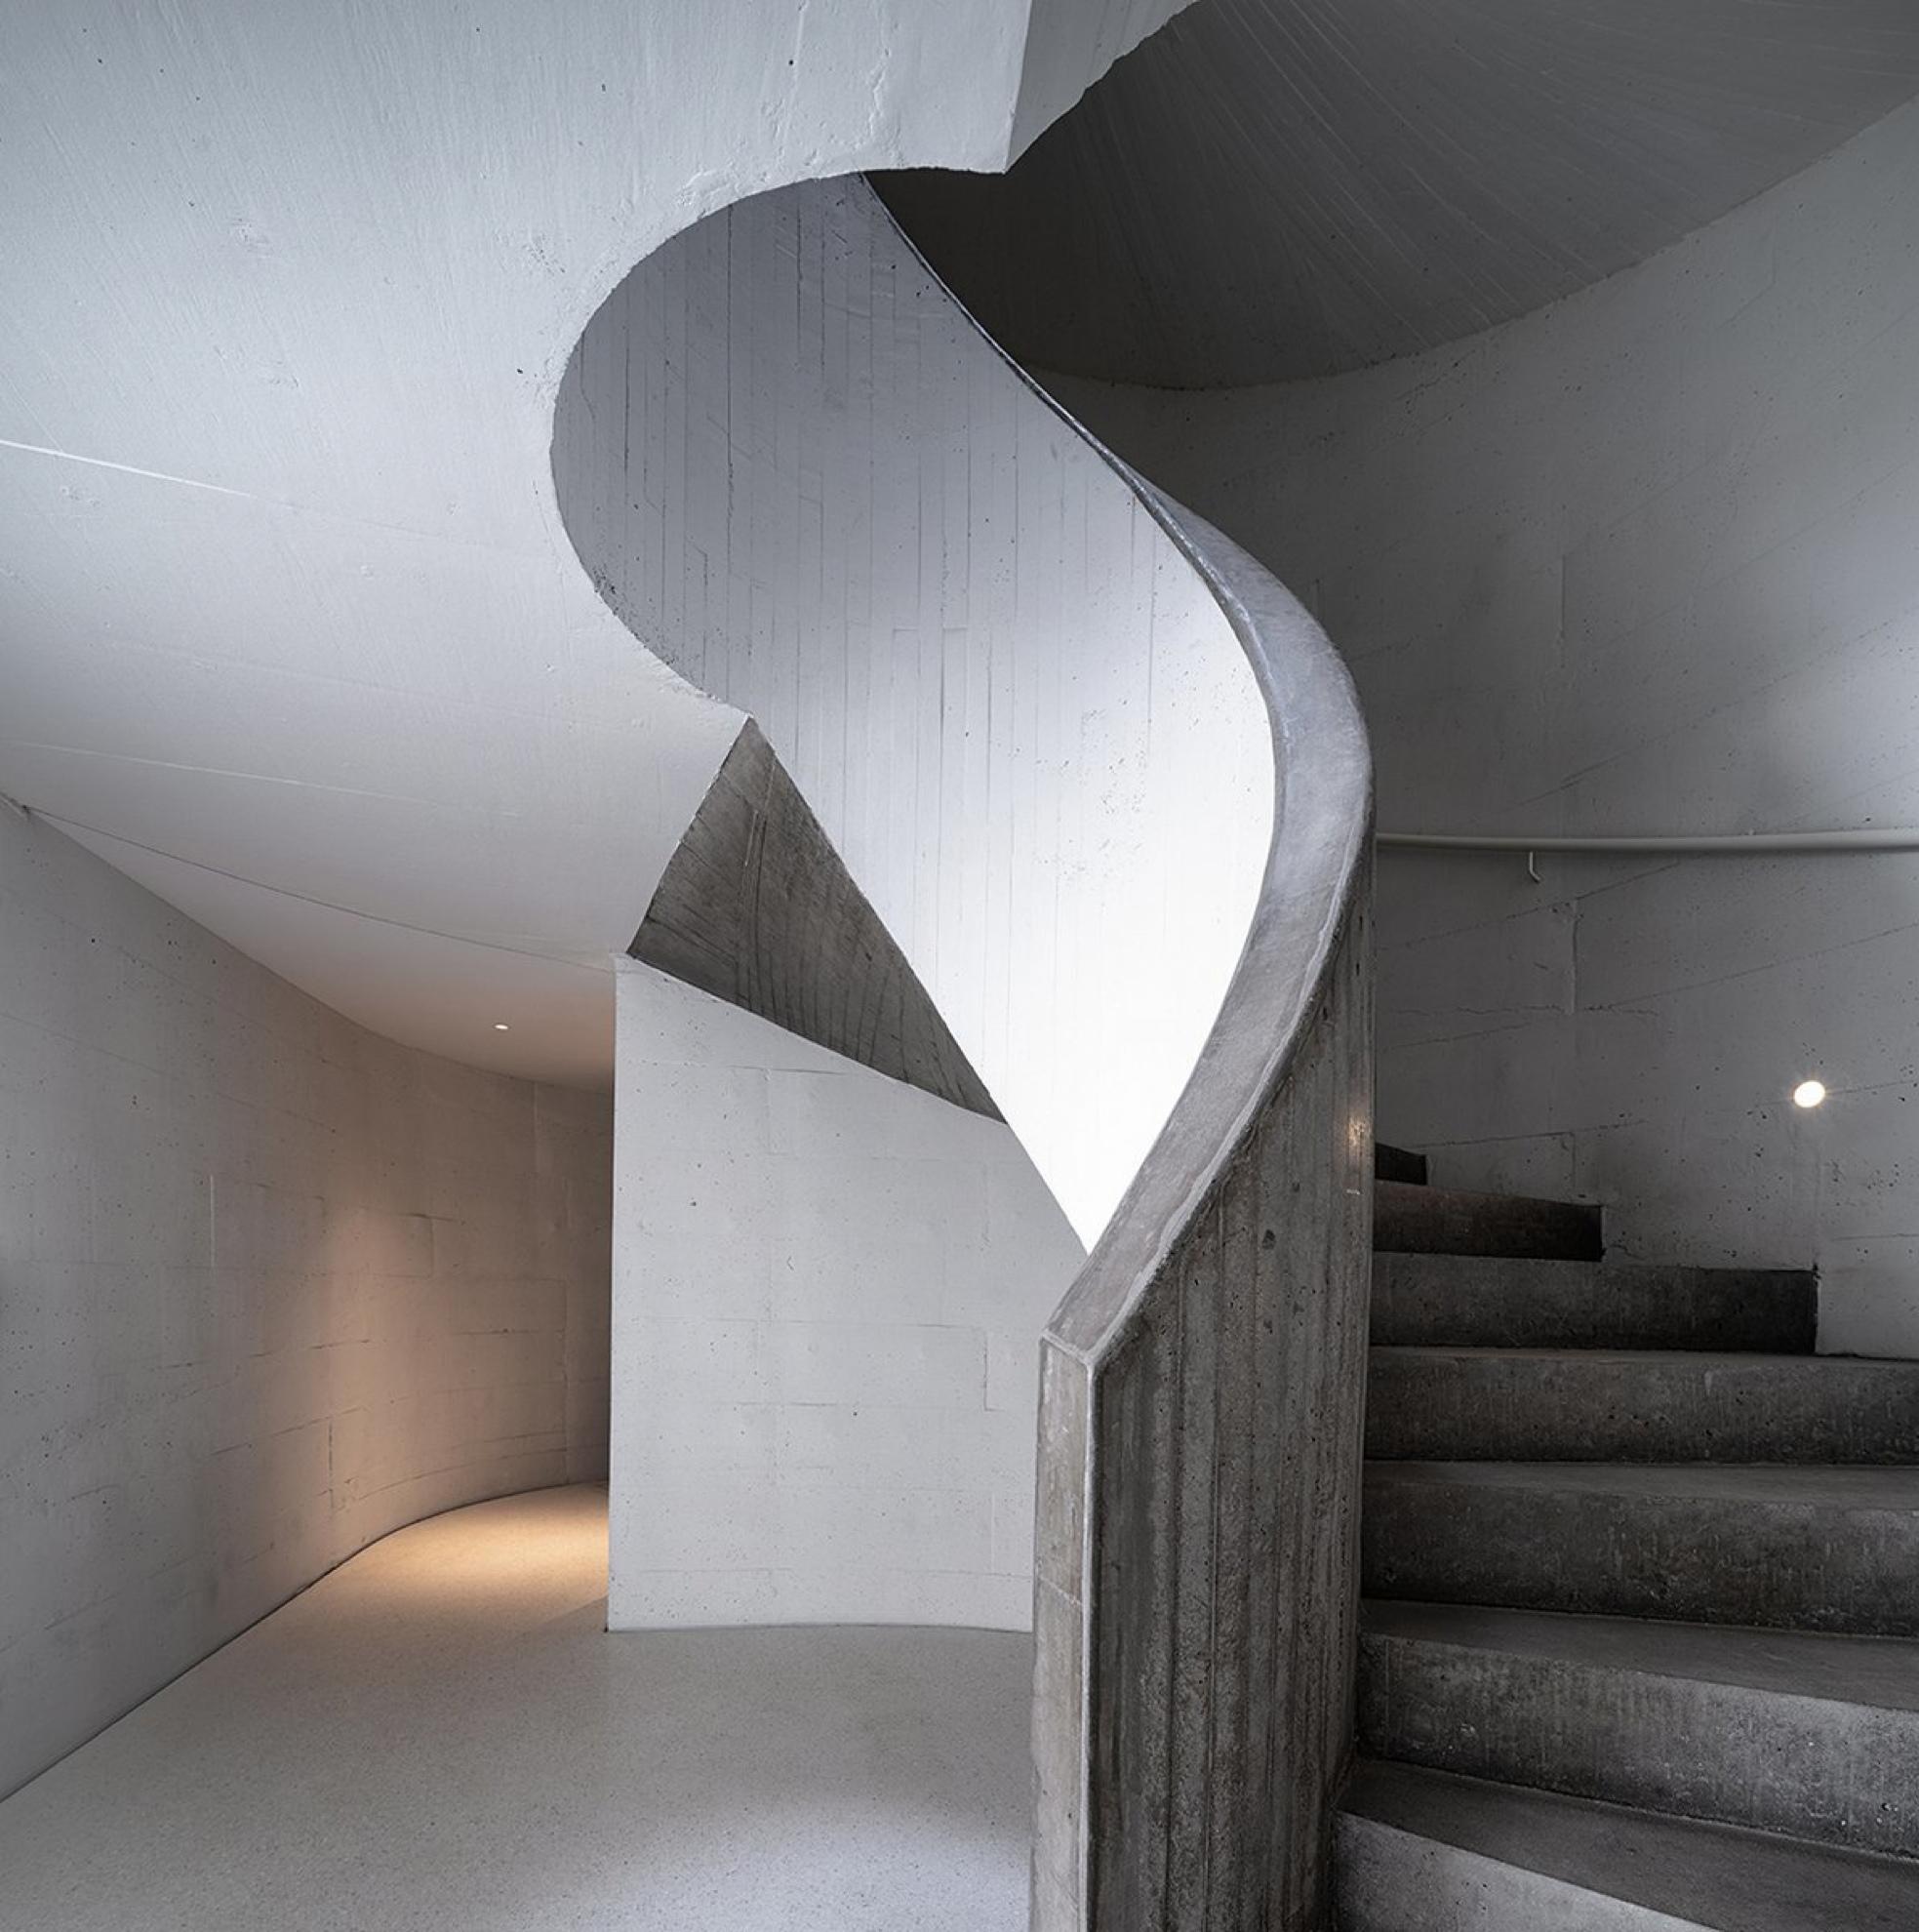 Výsledok vyhľadávania obrázkov pre dopyt ucca dune museum by open architecture in qinhuangdao china